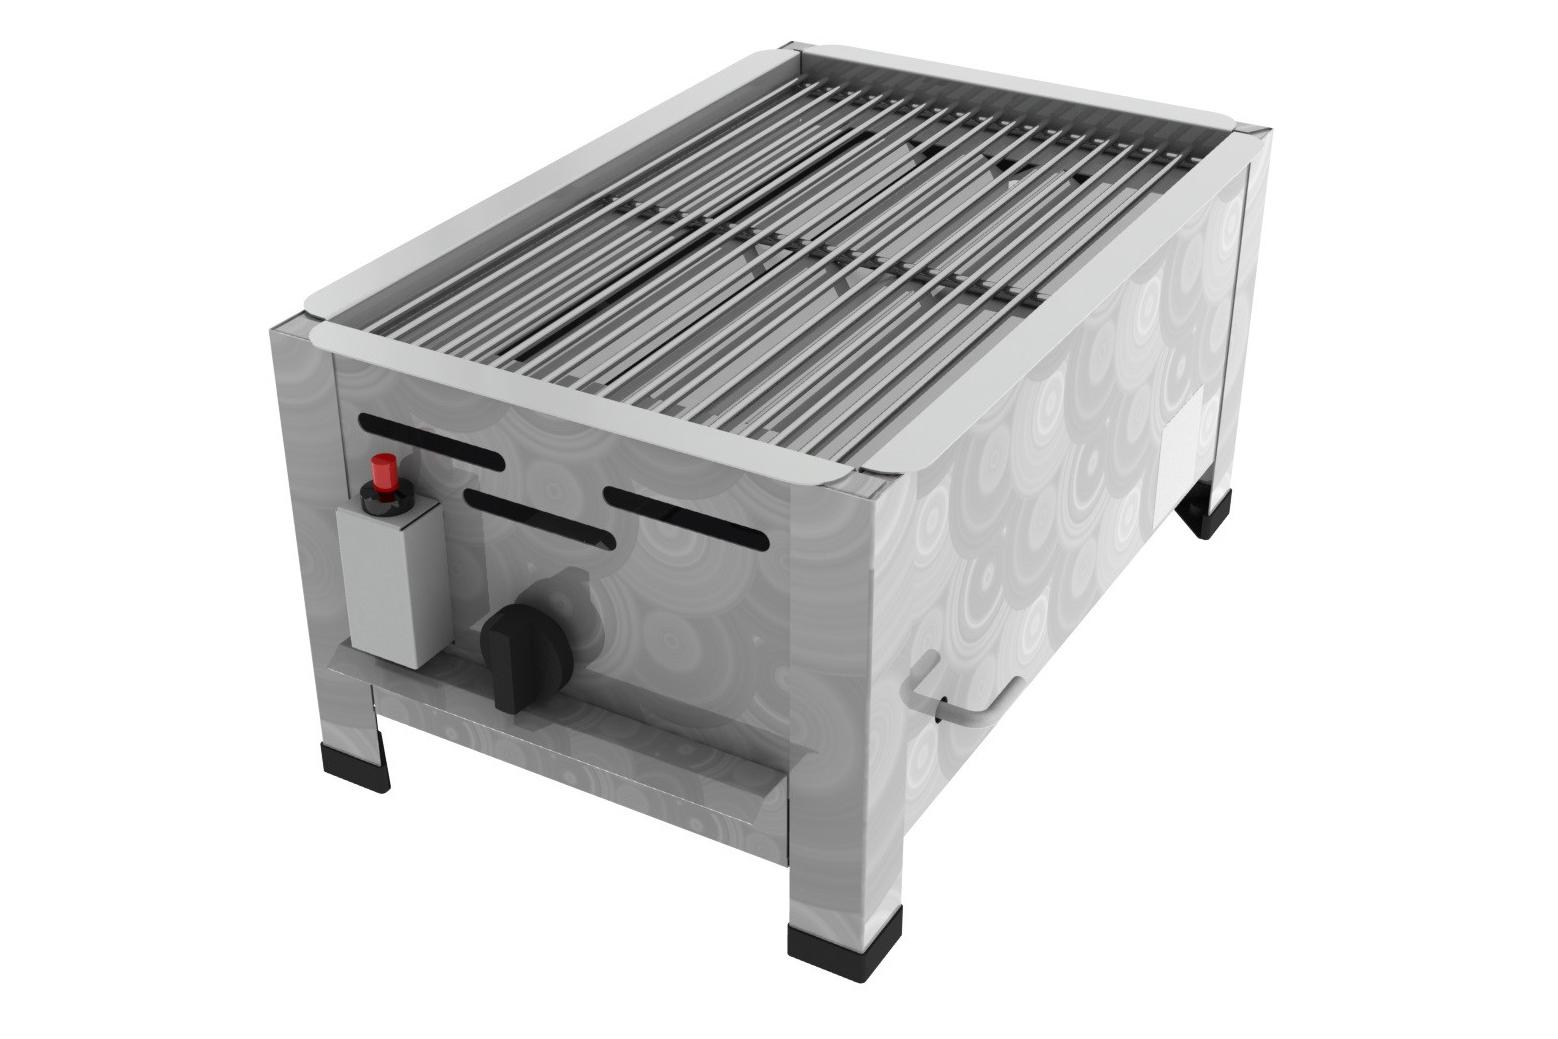 edelstahl gasgrill grillrost  kw  flammig